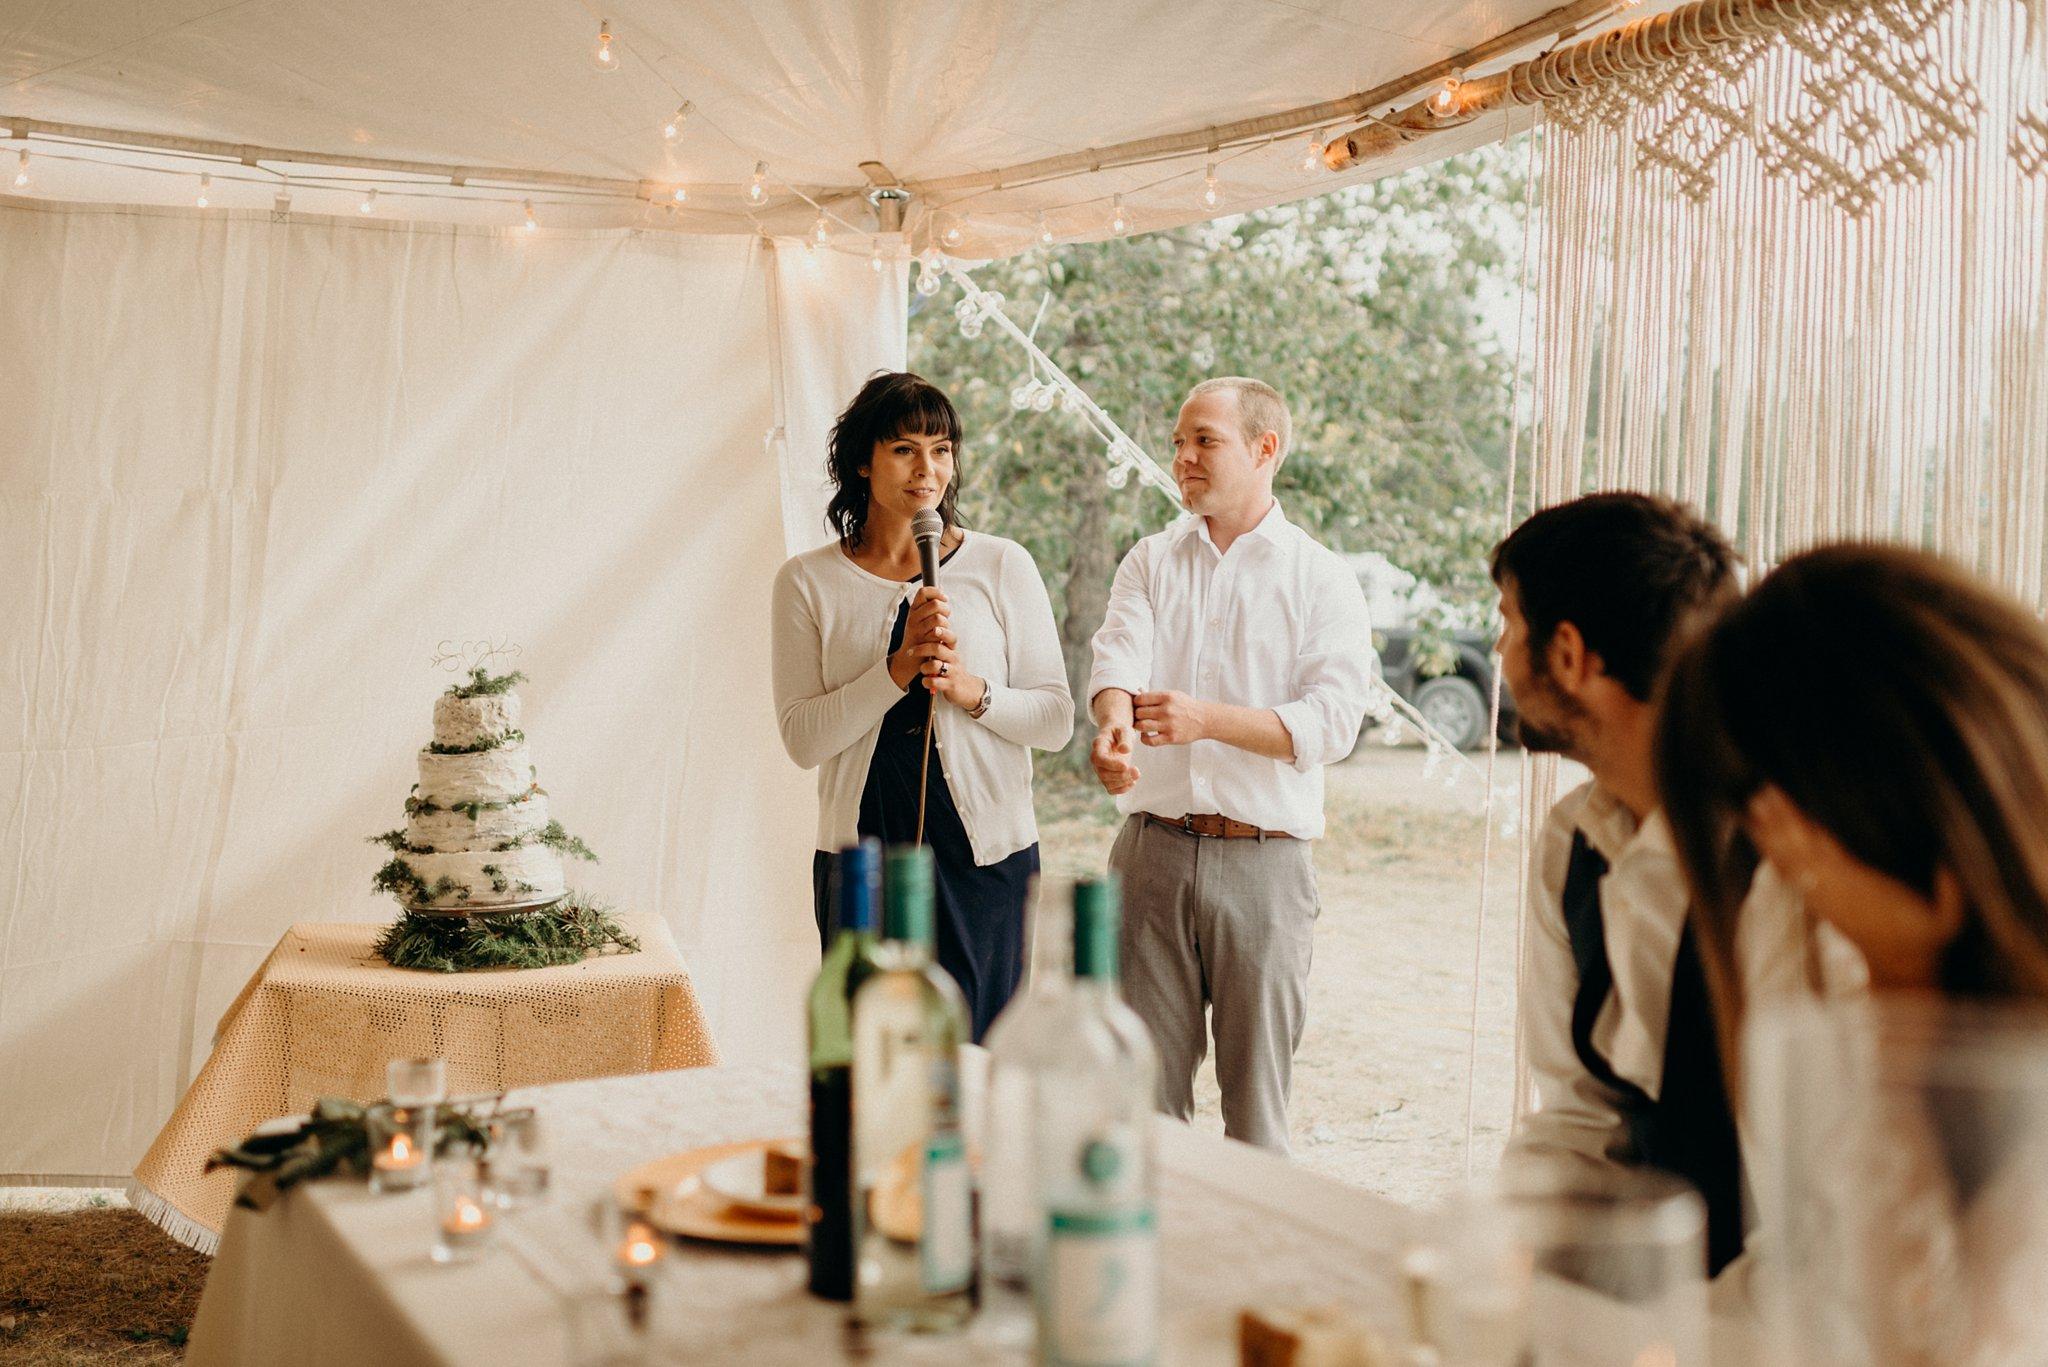 kaihla_tonai_intimate_wedding_elopement_photographer_6785.jpg